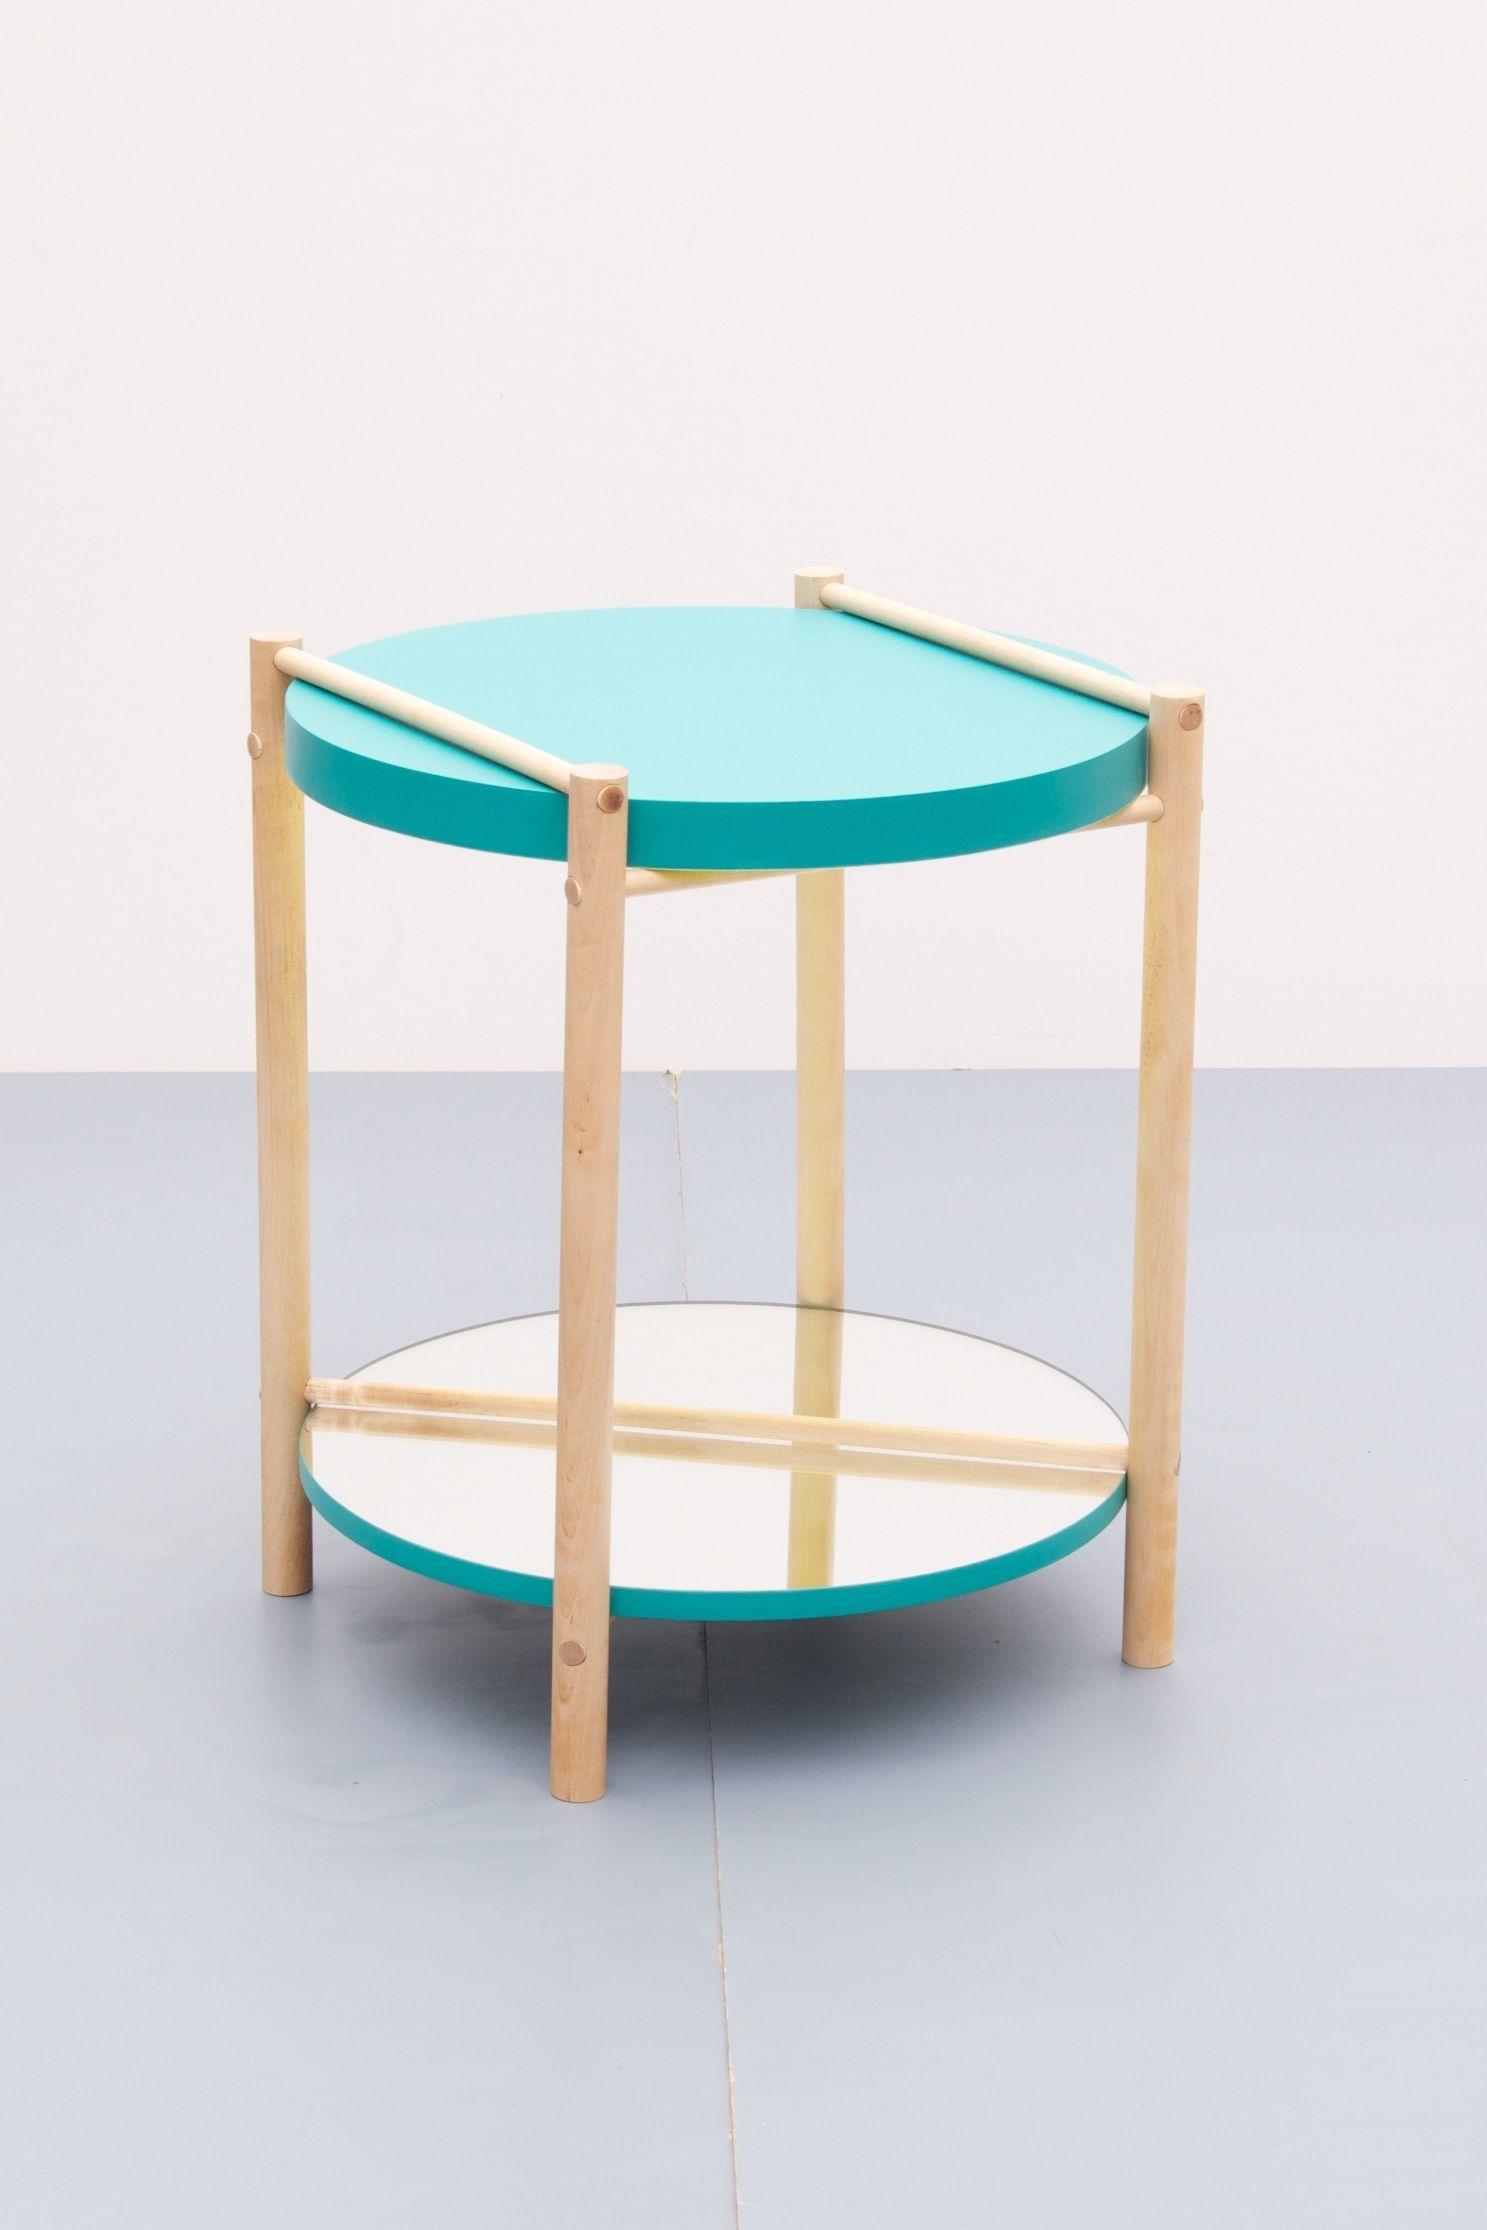 Village Side Table - 2012 - Lukas Peet Design